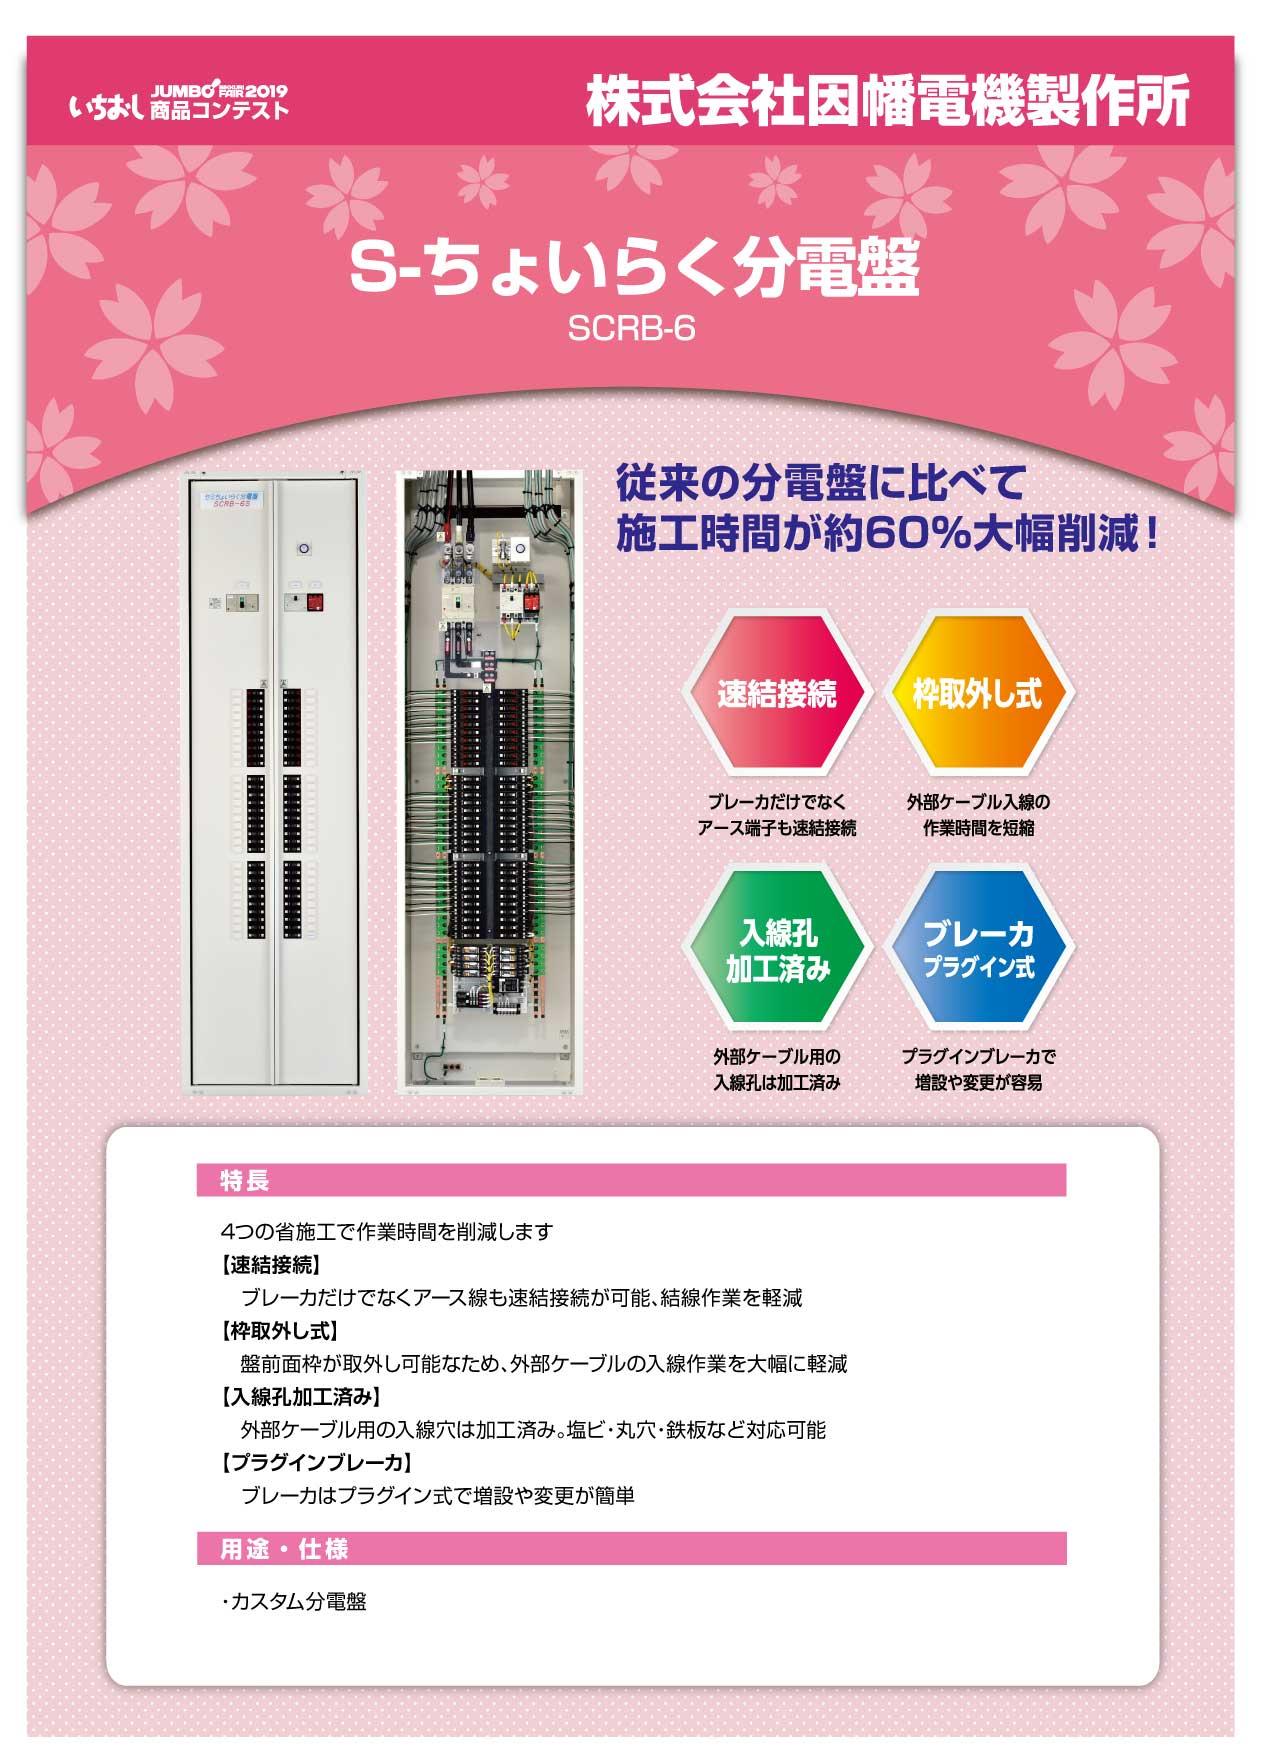 「S-ちょいらく分電盤」株式会社因幡電機製作所の画像